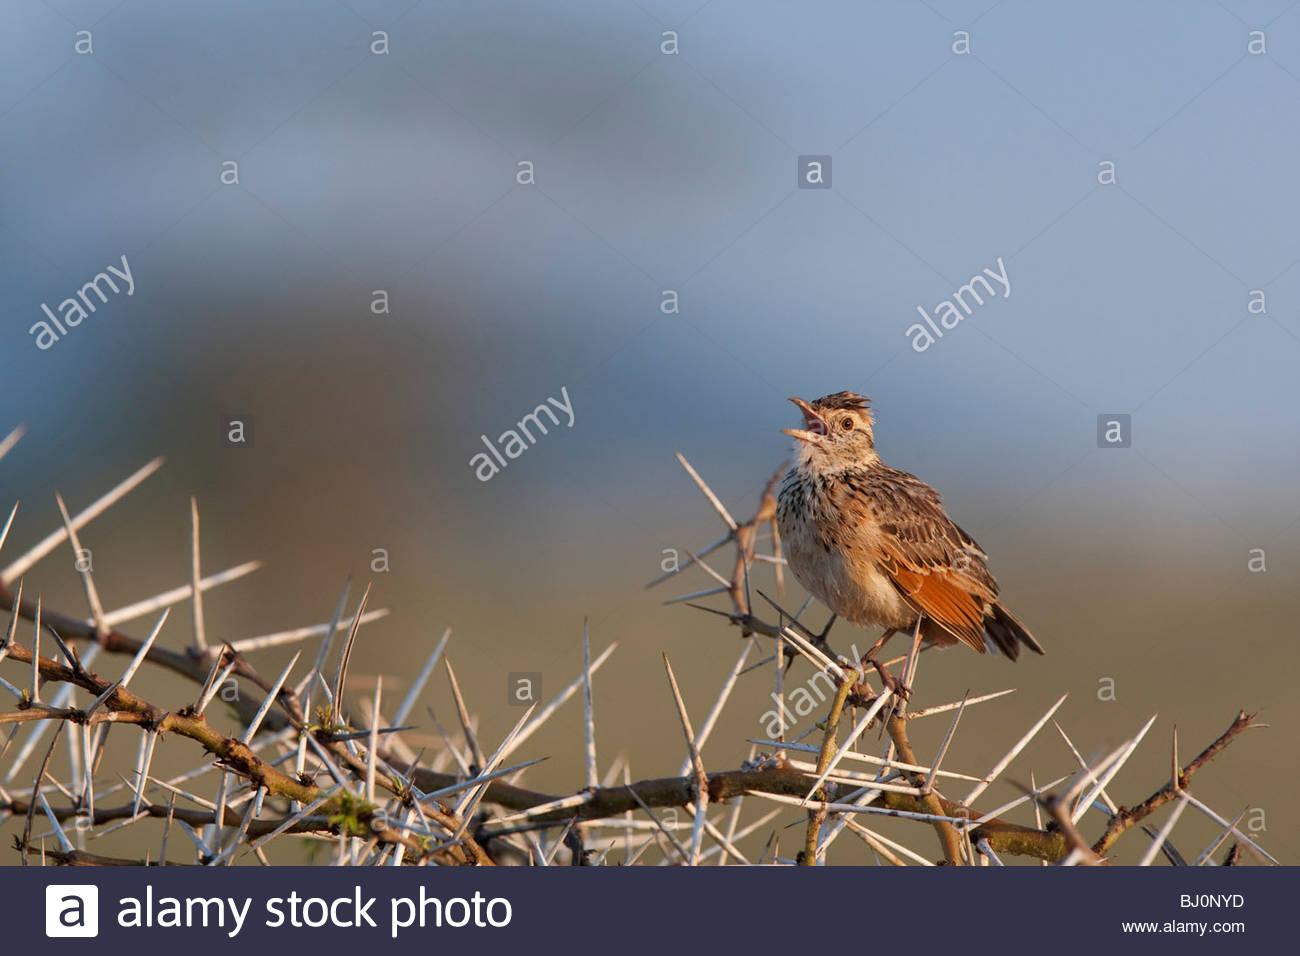 A Rufous-naped Lark (Mirafra africana) singing from a Acacia tree. Serengeti National Park, Tanzania. Stock Photo